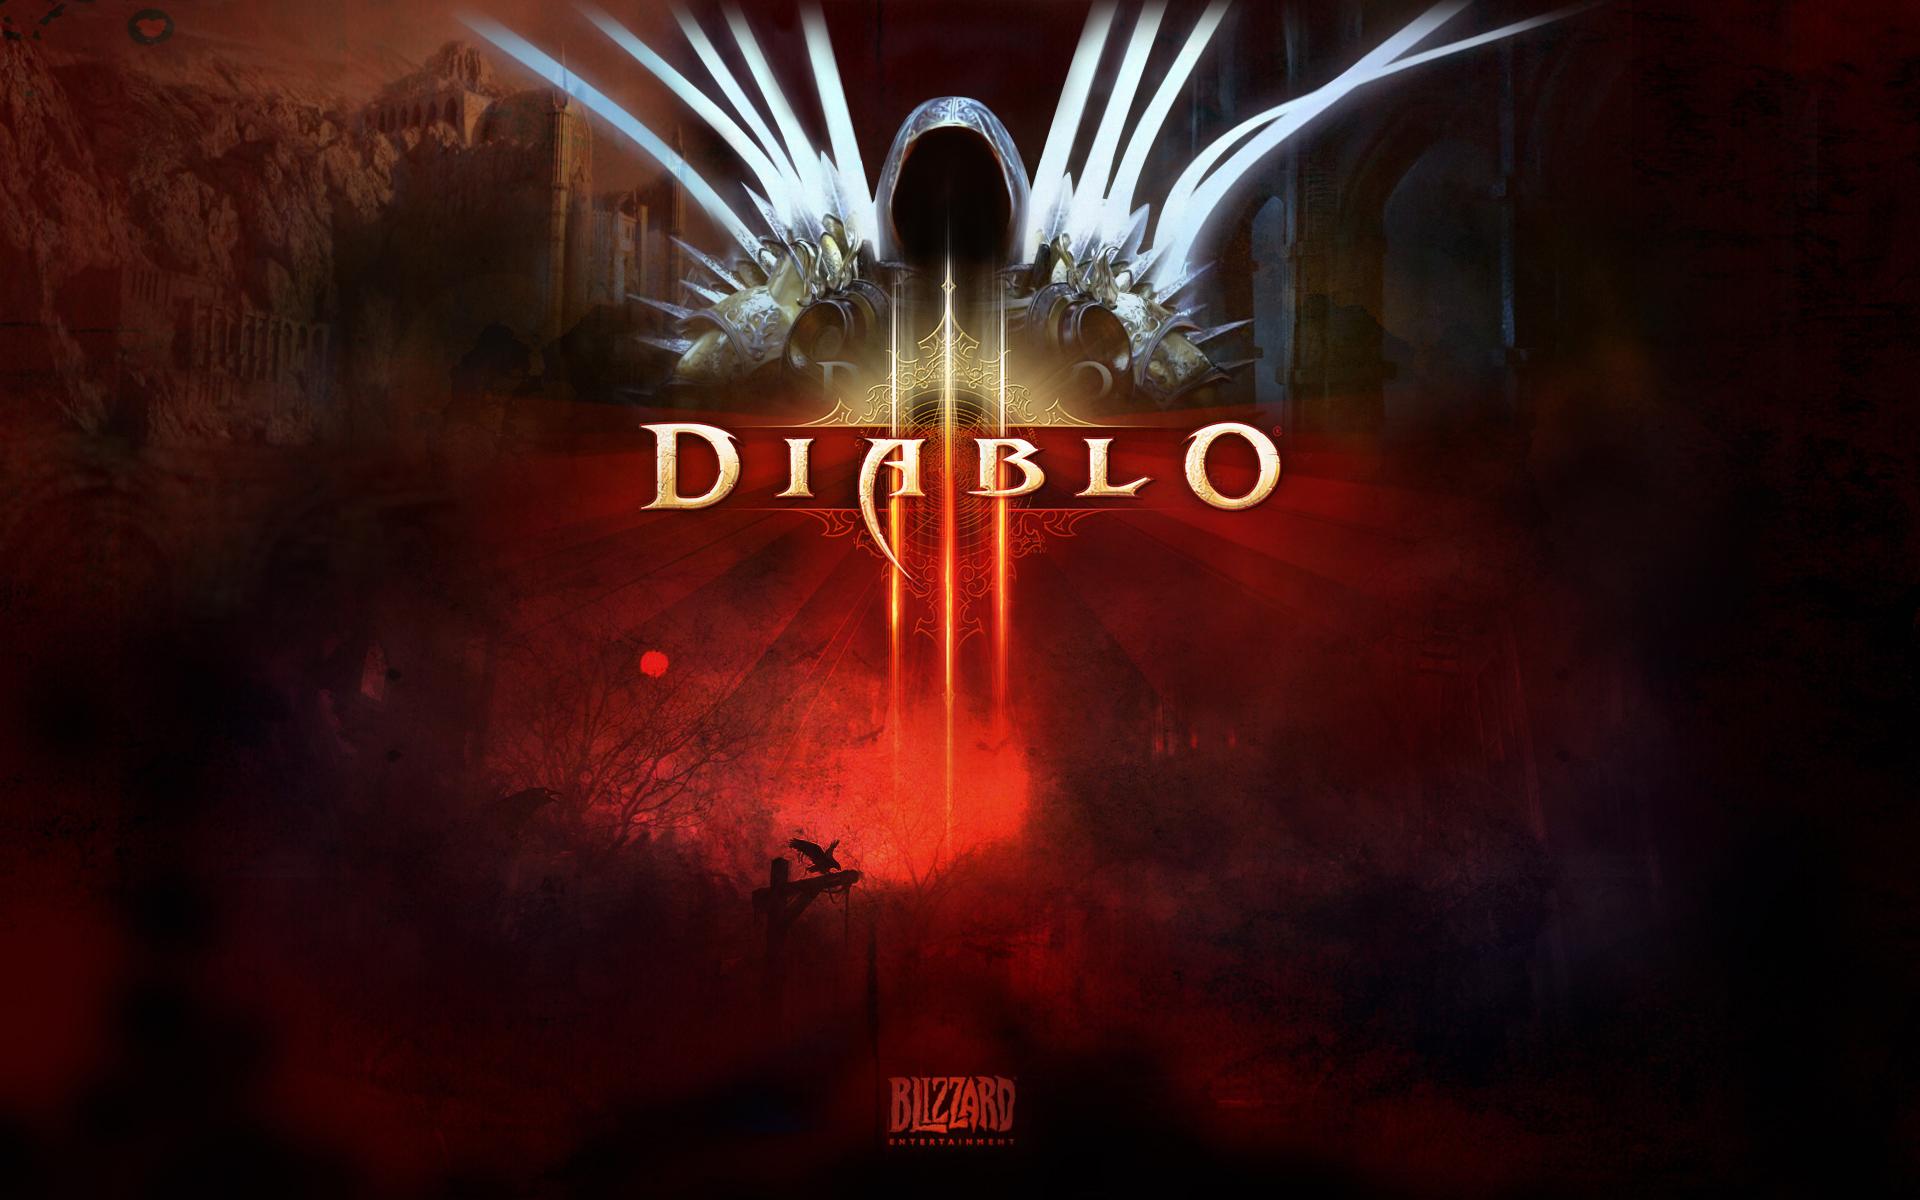 Diablo III background art by nshipp 1920x1200